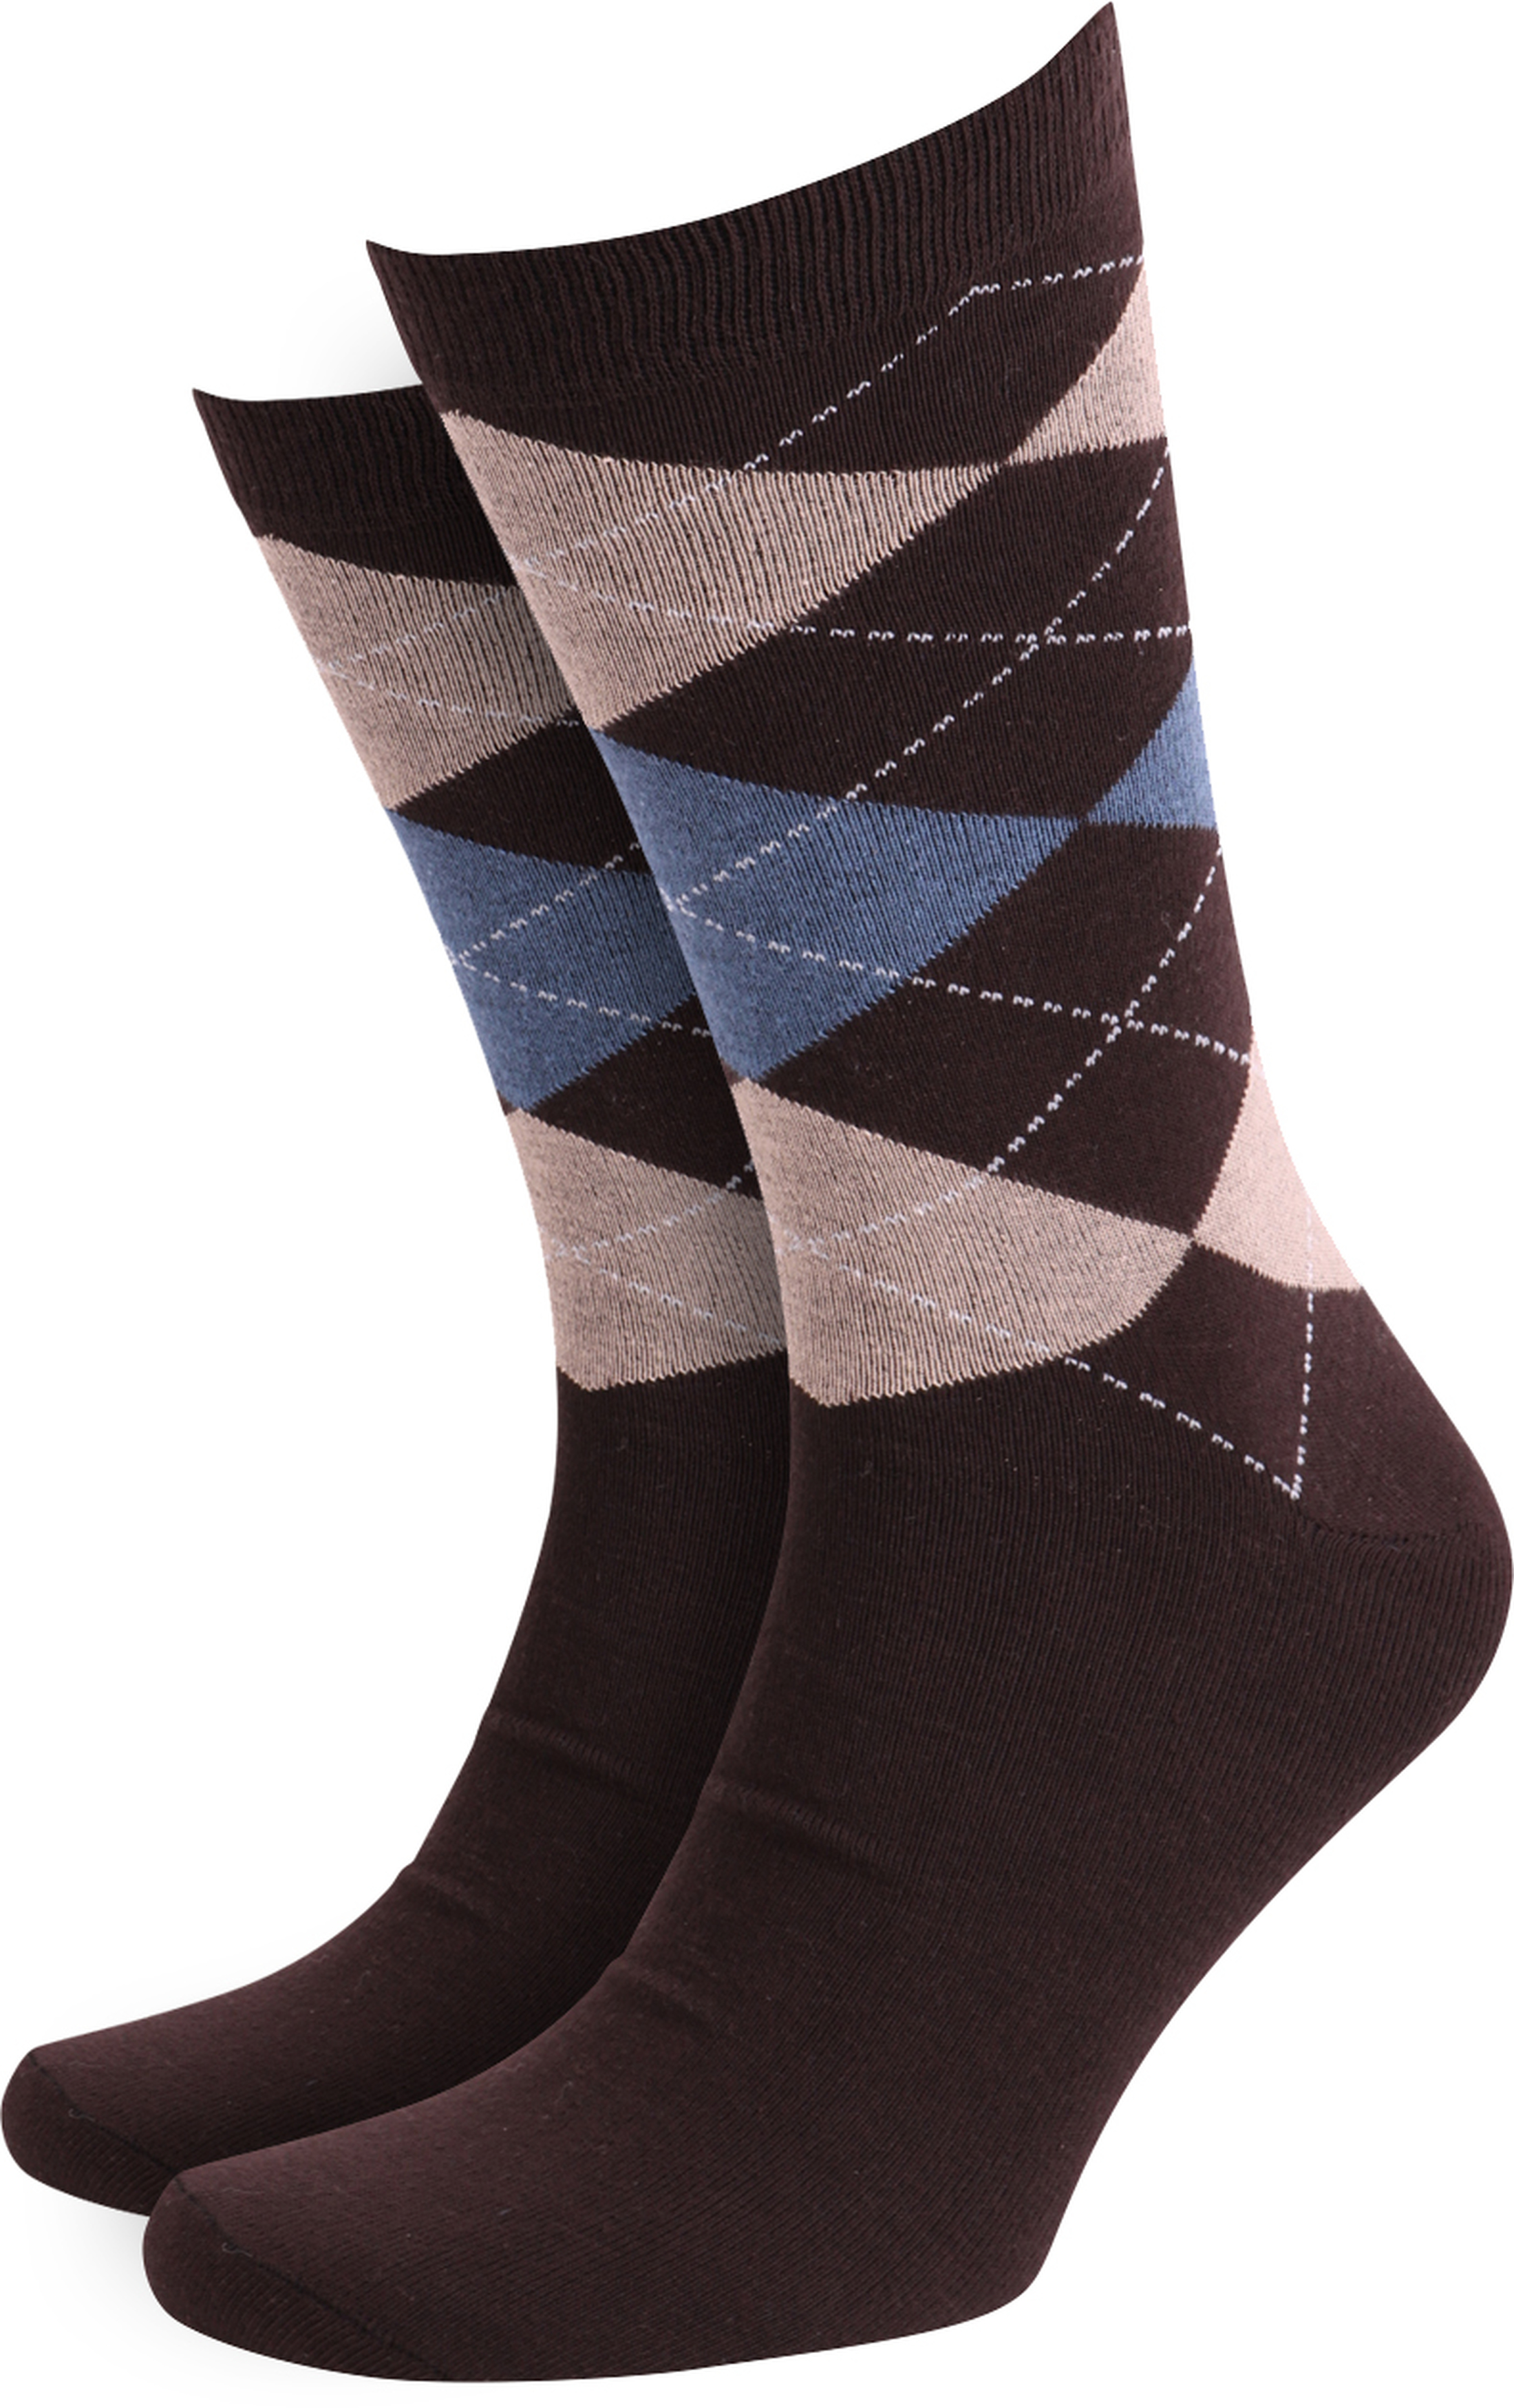 Suitable Socken Kariert Braun foto 0